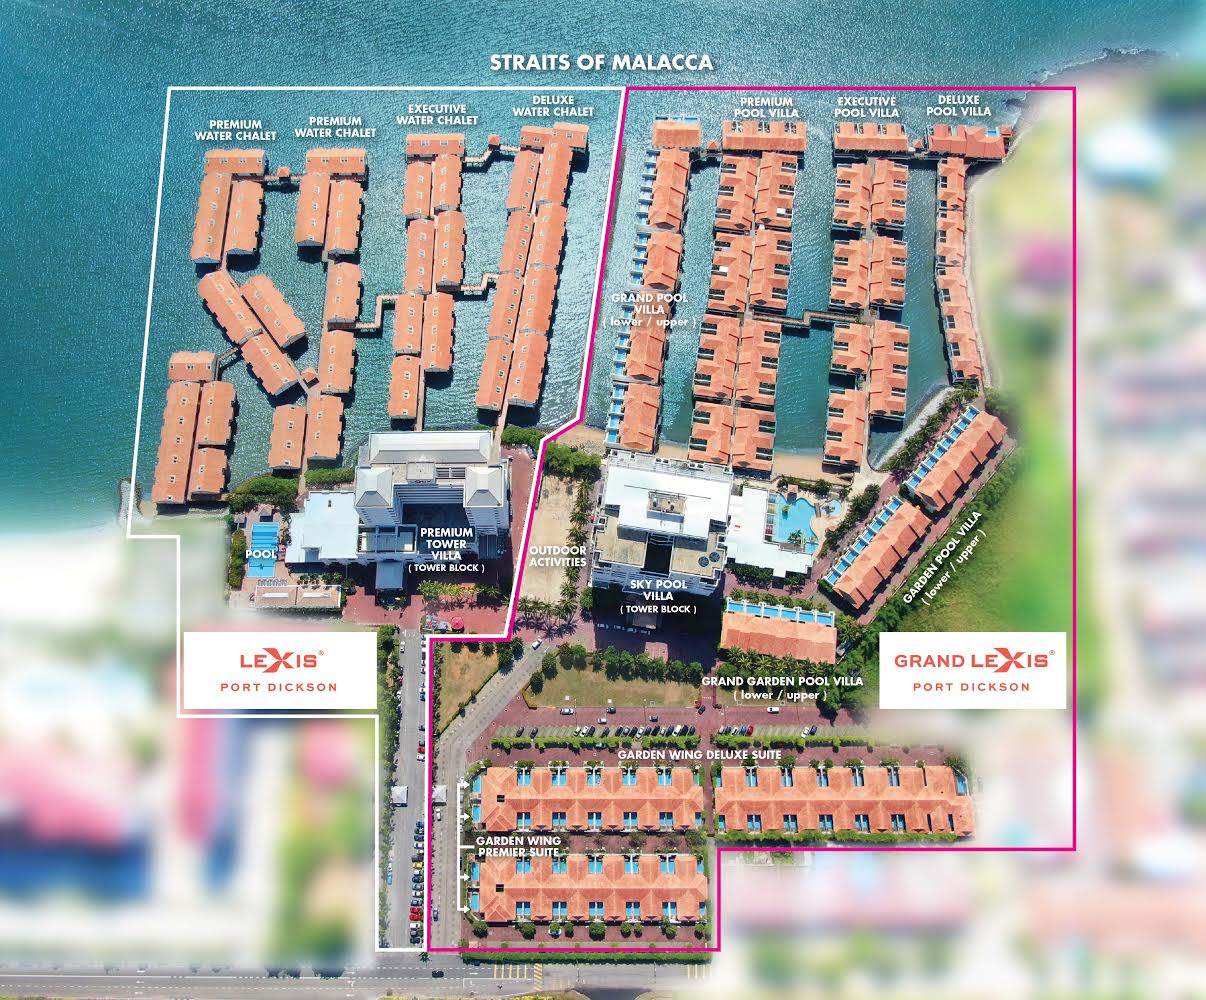 Lexis Port Dickson Room Location Map